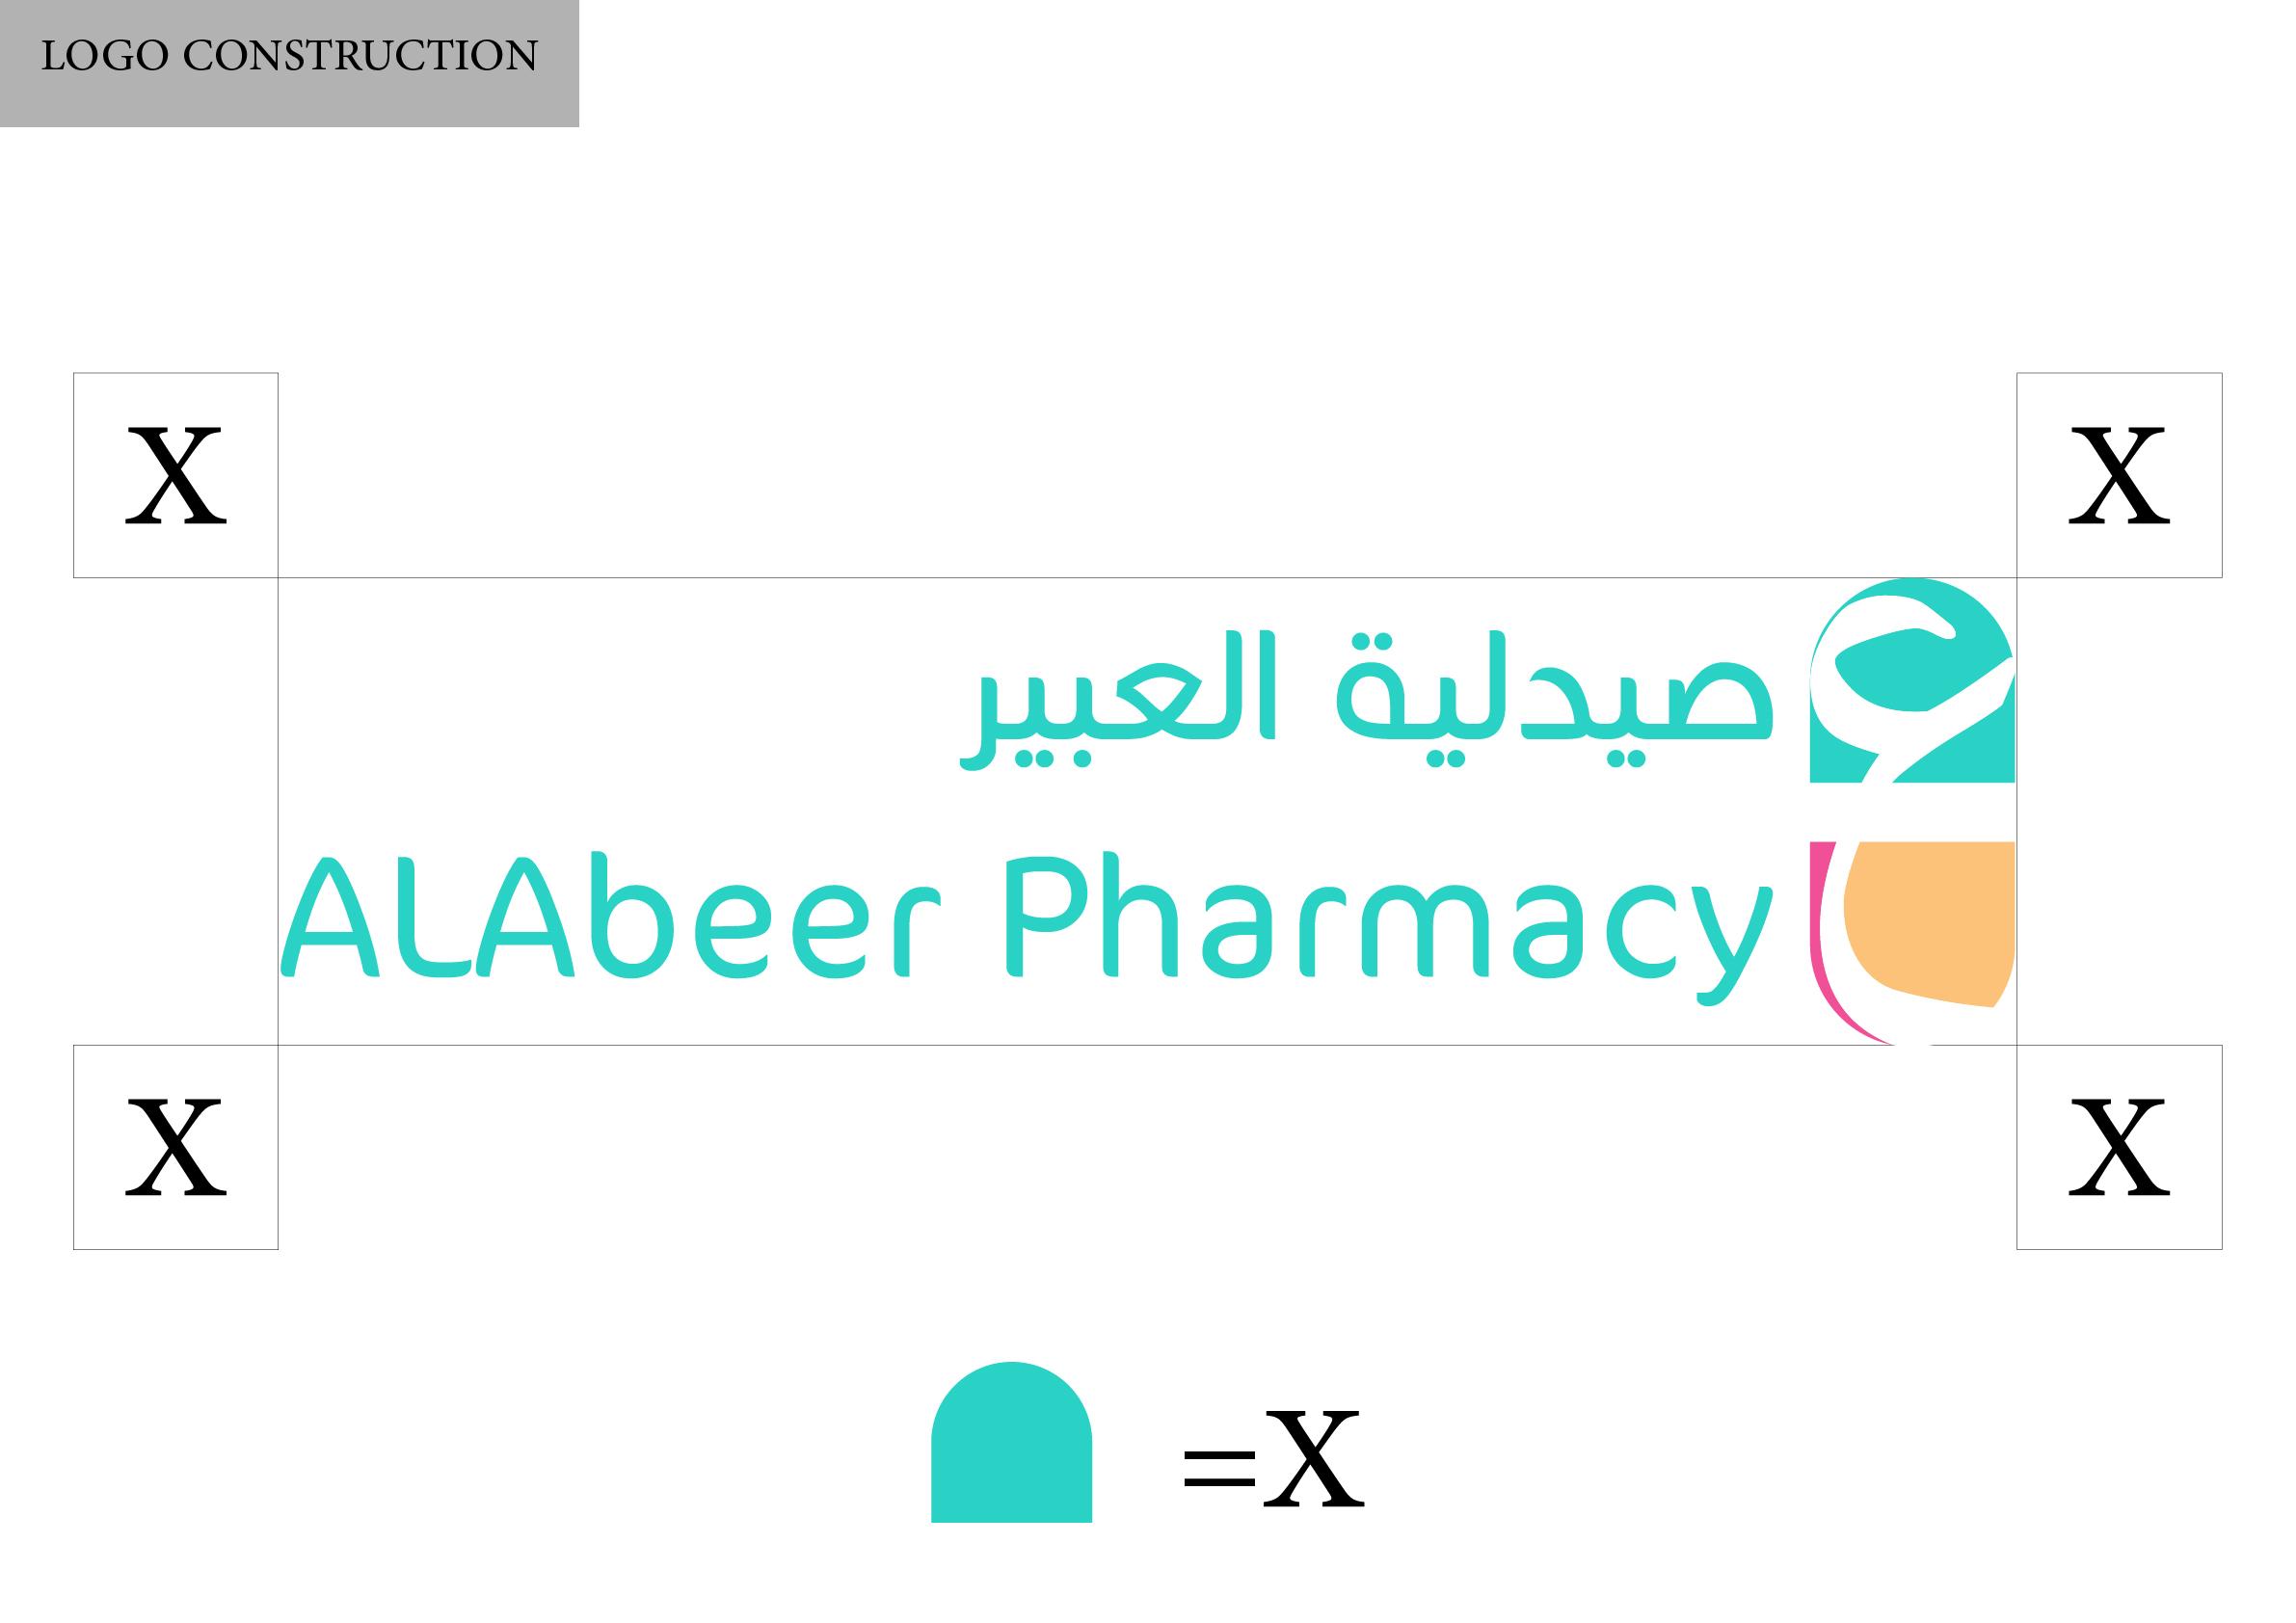 alabeer pharmacy logo construction